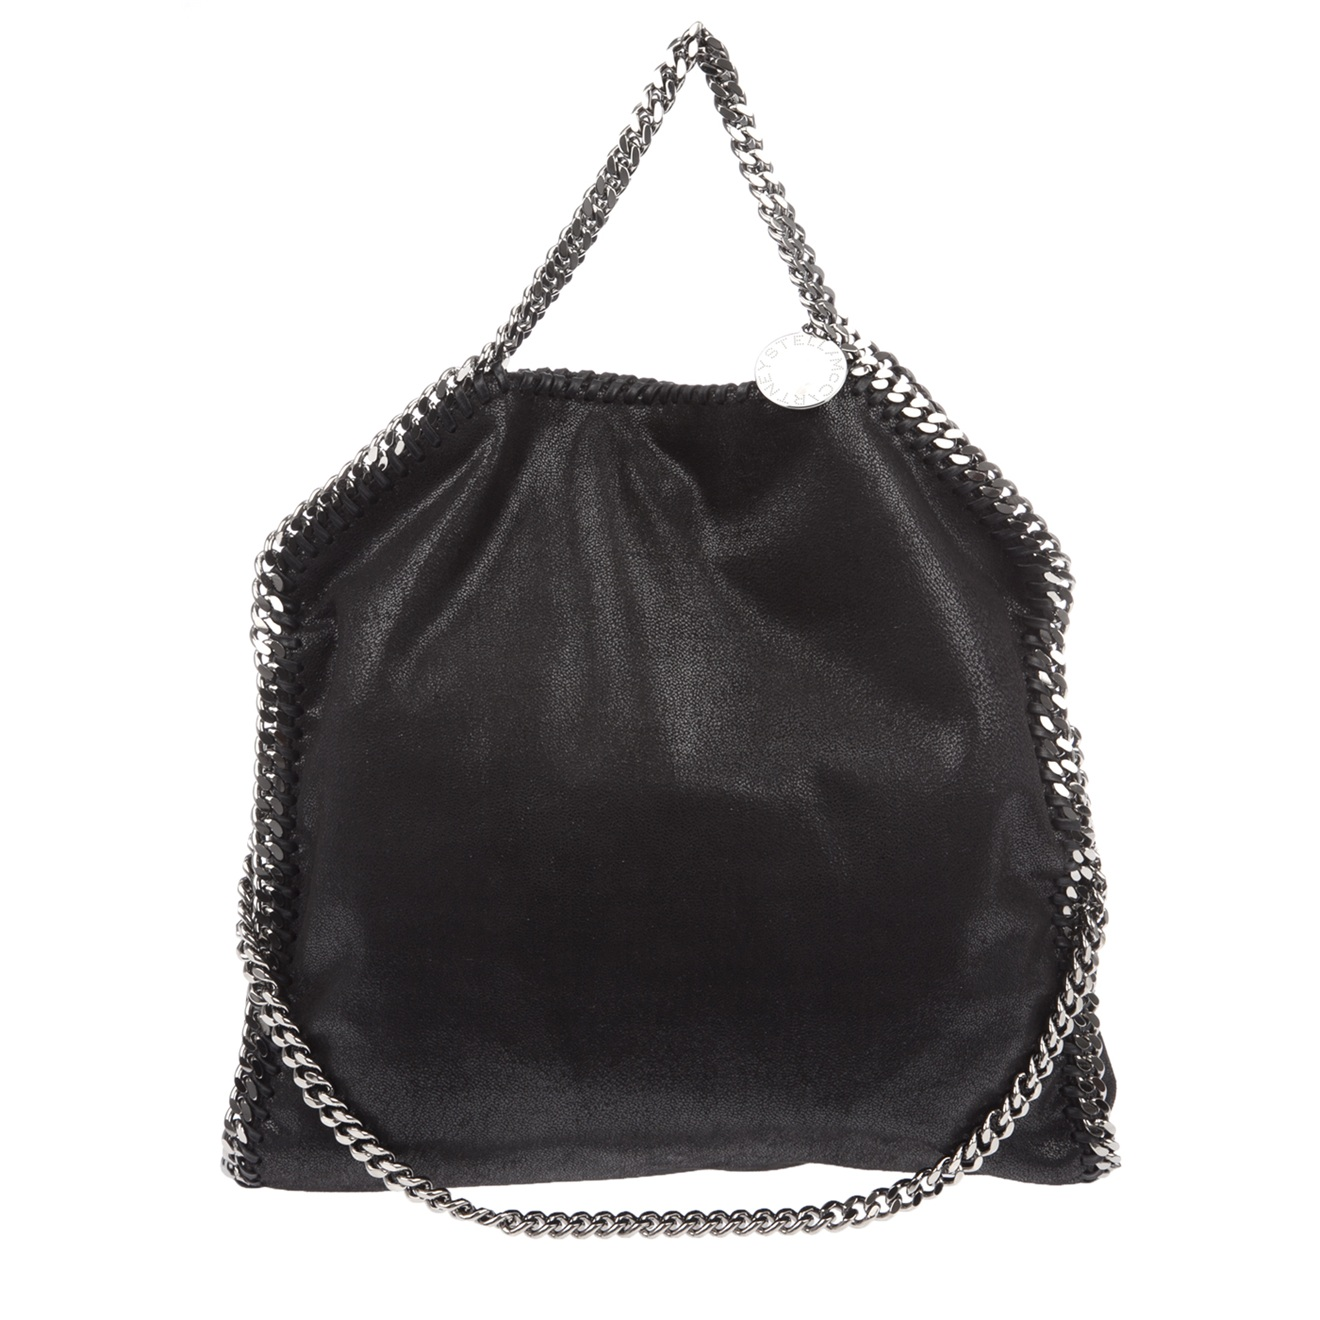 Stella mccartney Falabella Bag in Black